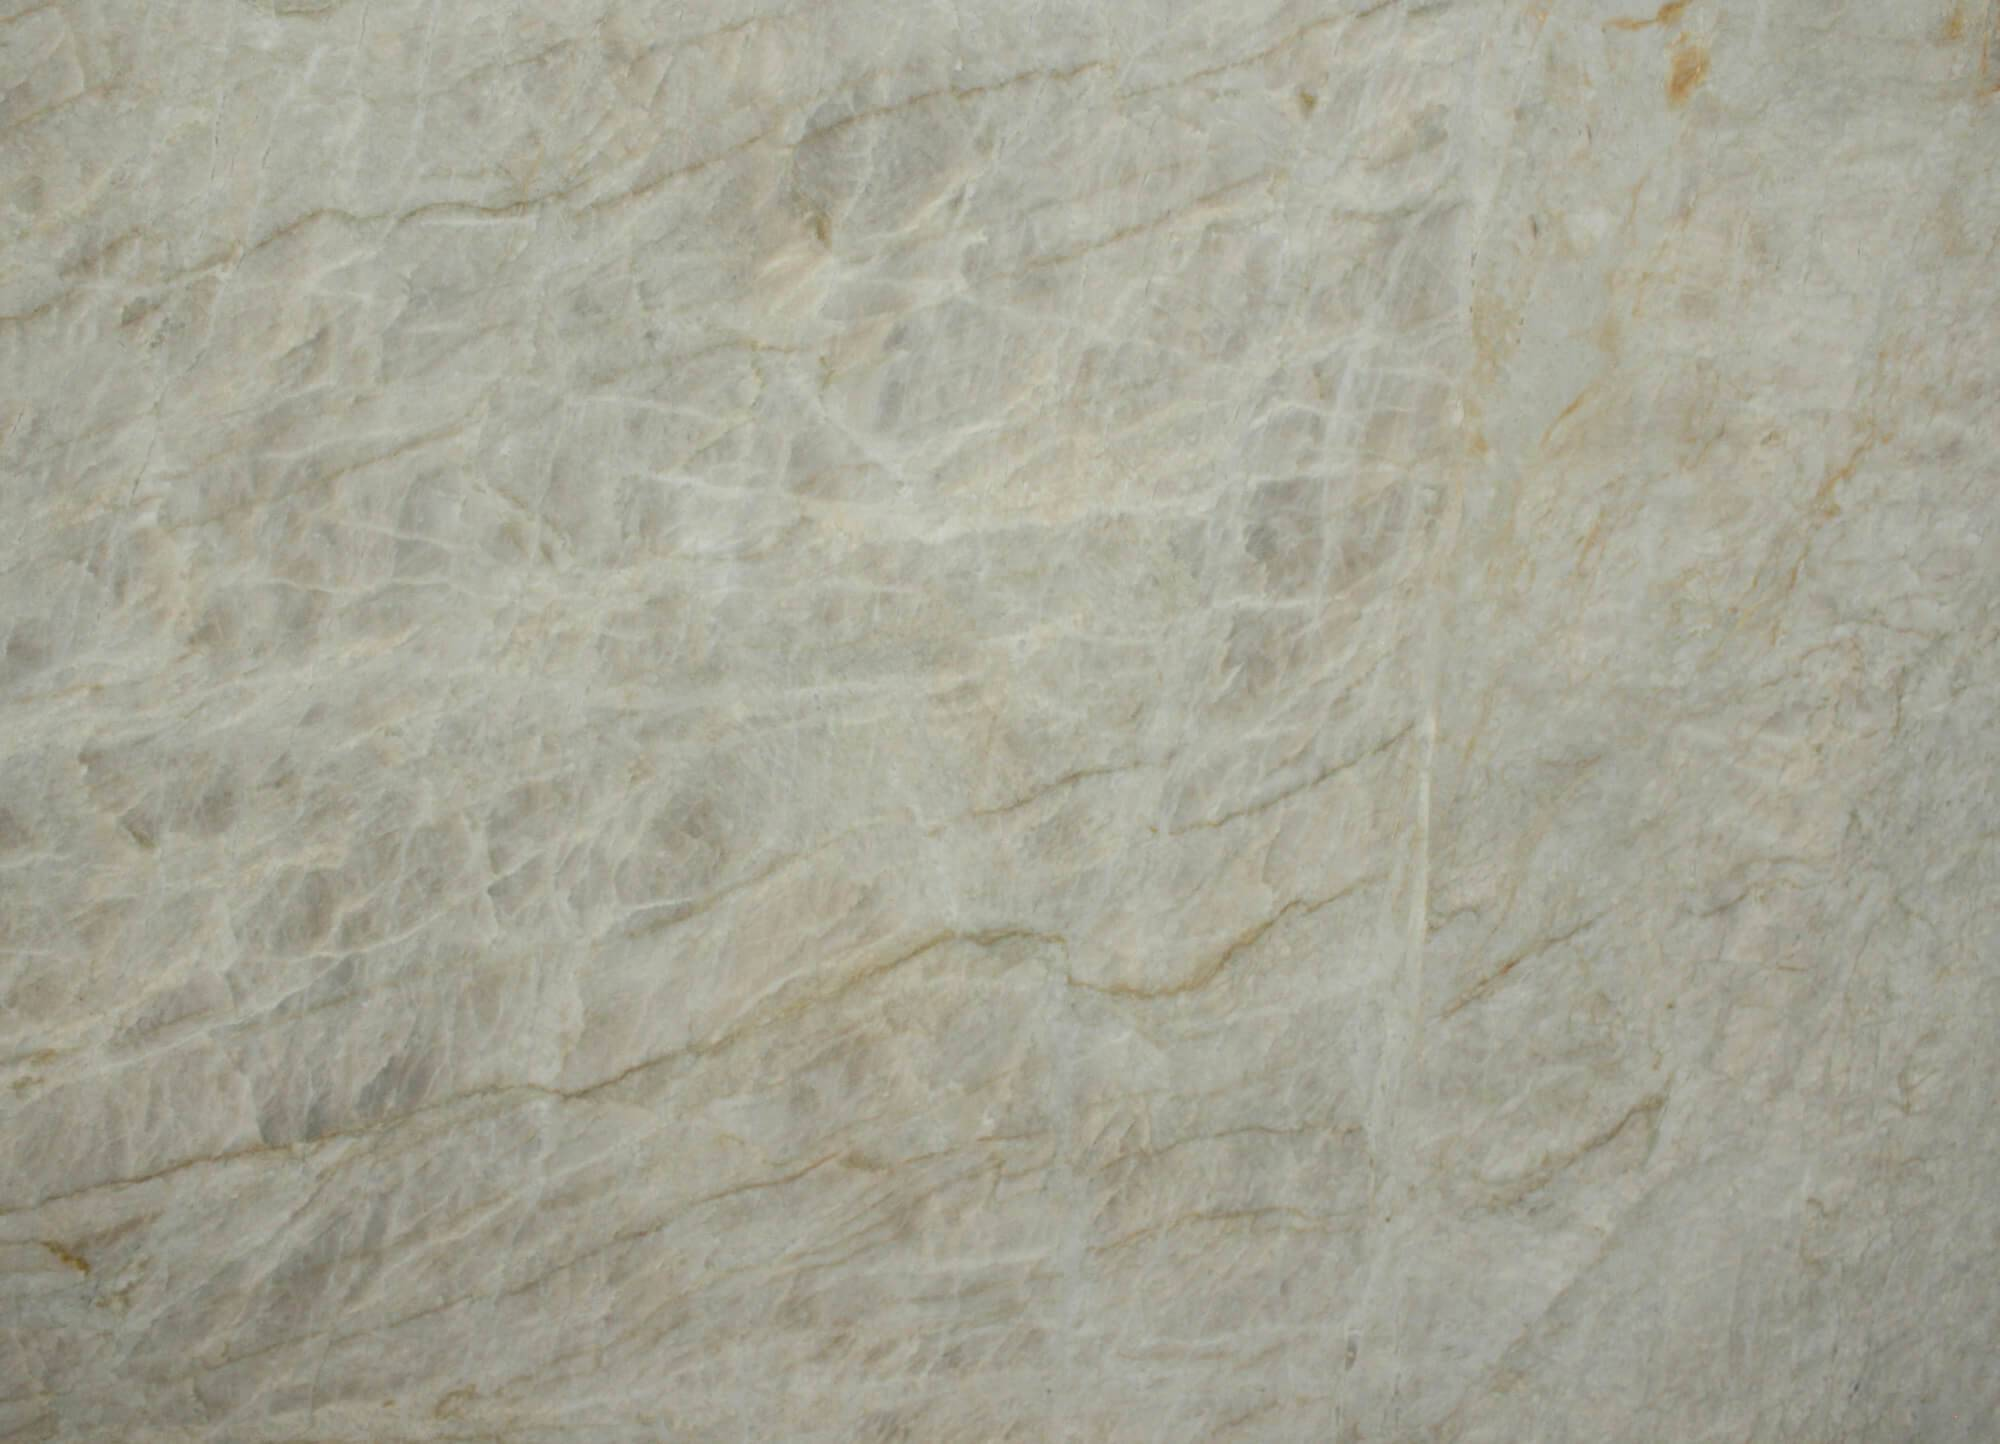 White Victoria фото 1 — камень от Bevers Marmyr